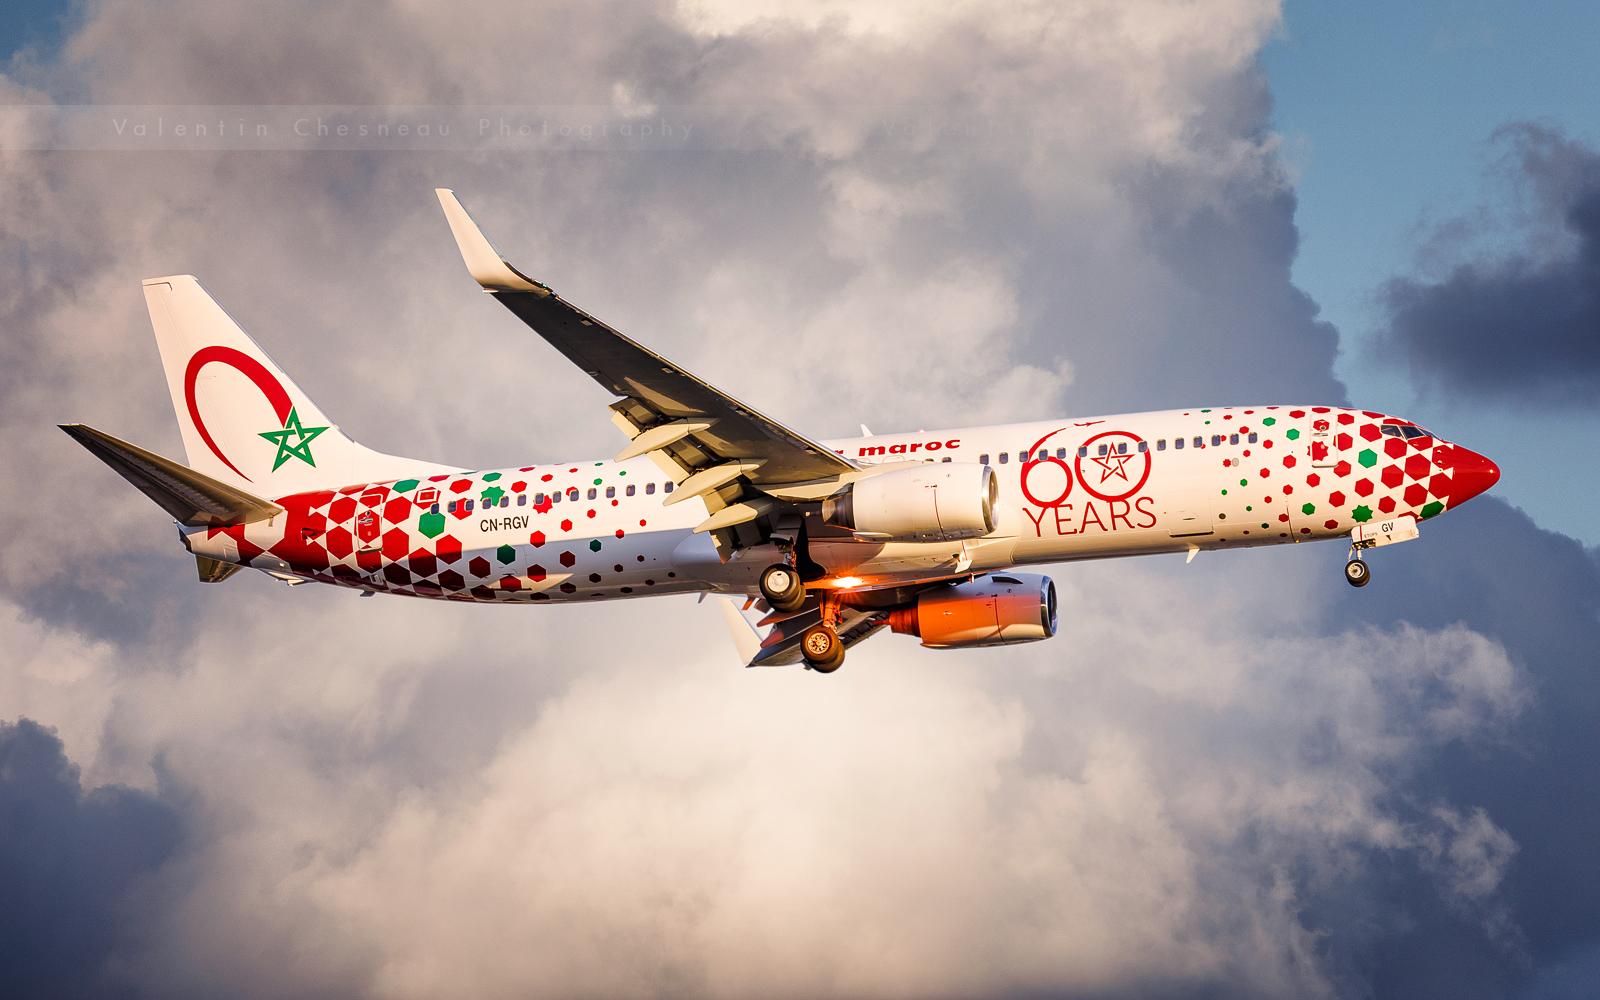 Royal Air Maroc - Page 20 36043209001_a165c79d40_o